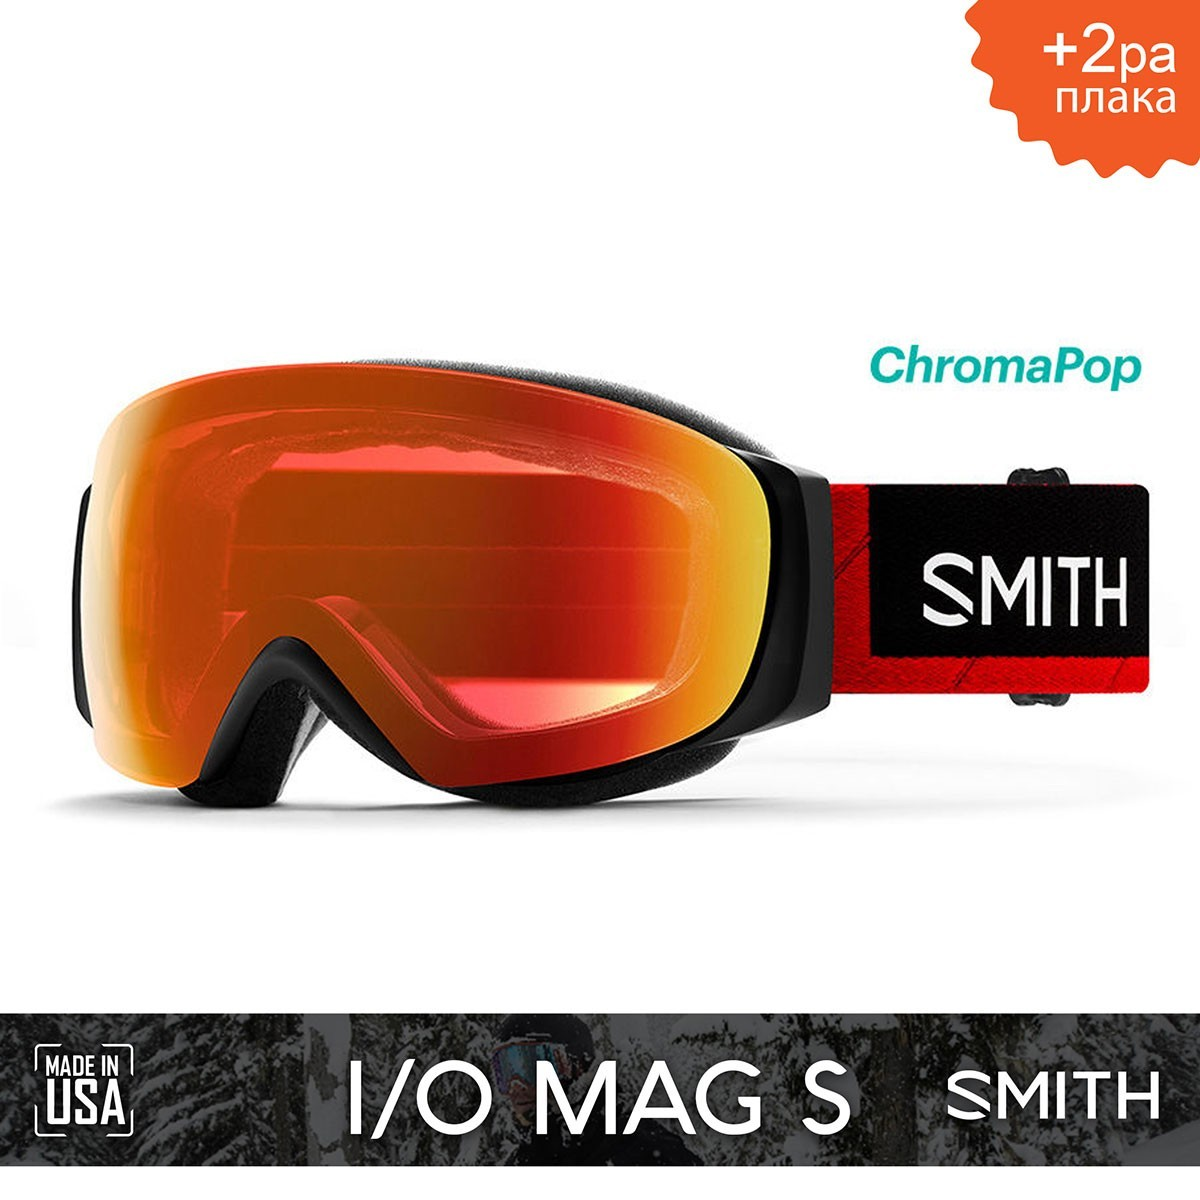 SMITH IO MAG S AC Smatte X North Face | S2 CHROMAPOP Everyday Red Mirror - Изображение - AQUAMATRIX